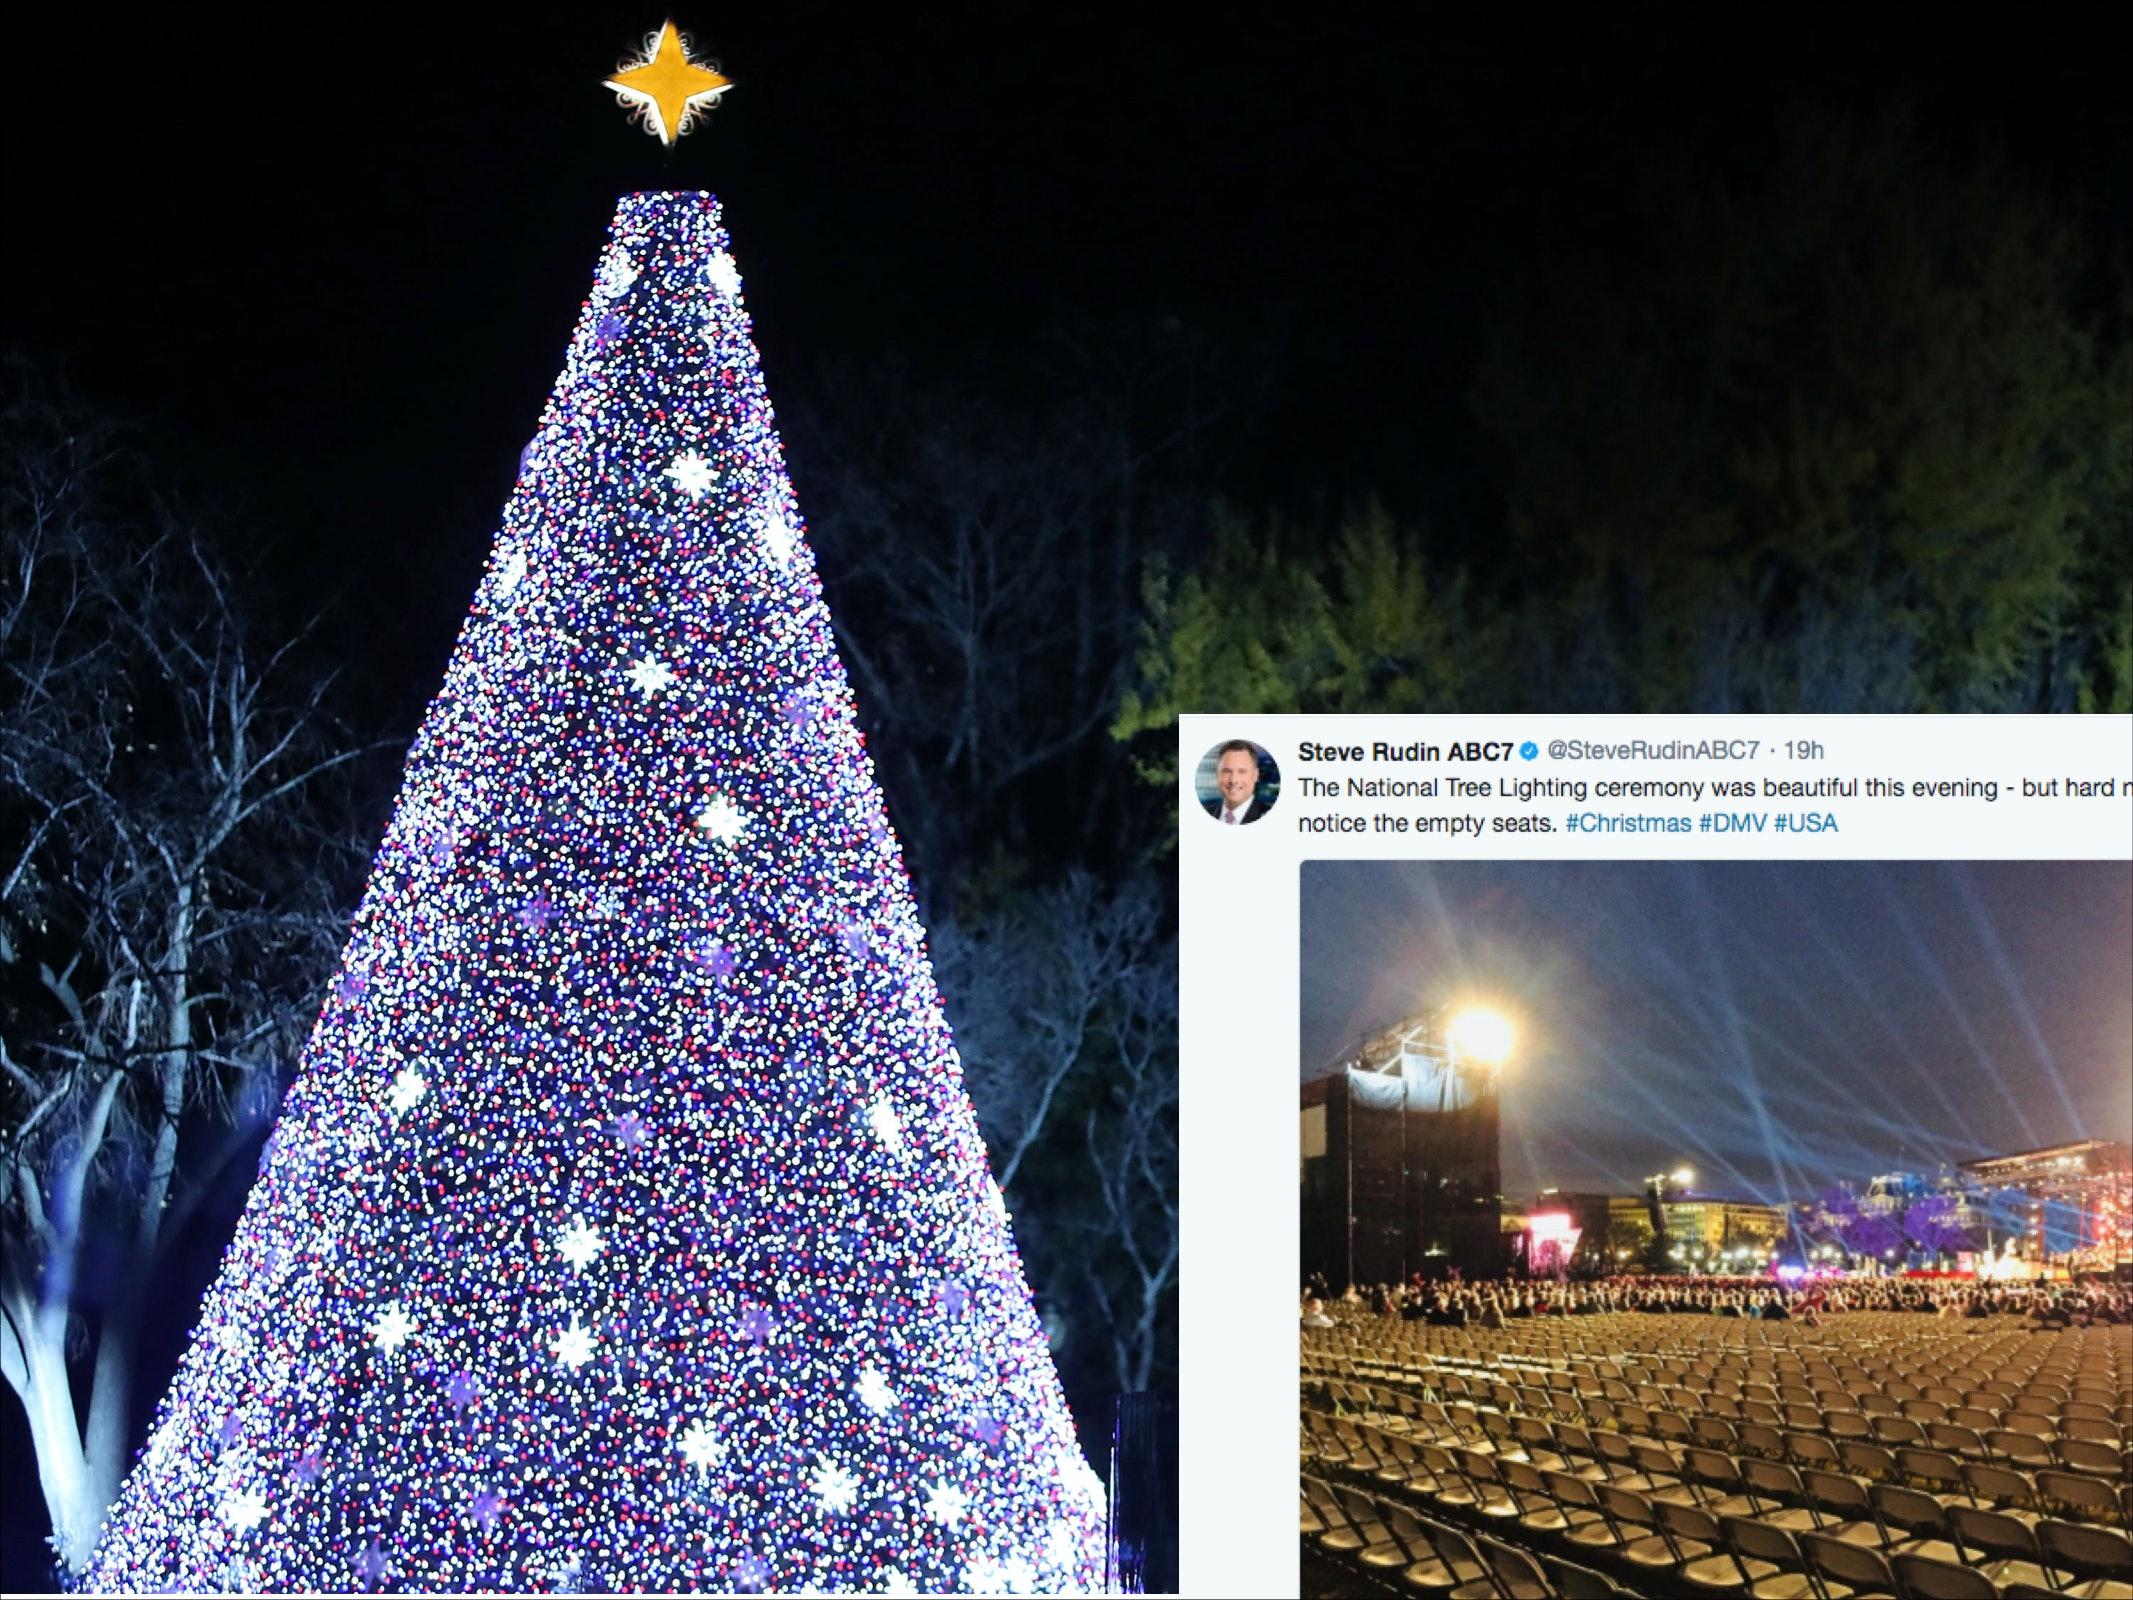 & Photos Of Trumpu0027s Christmas Tree Lighting Are All Kinds Of Awkward azcodes.com